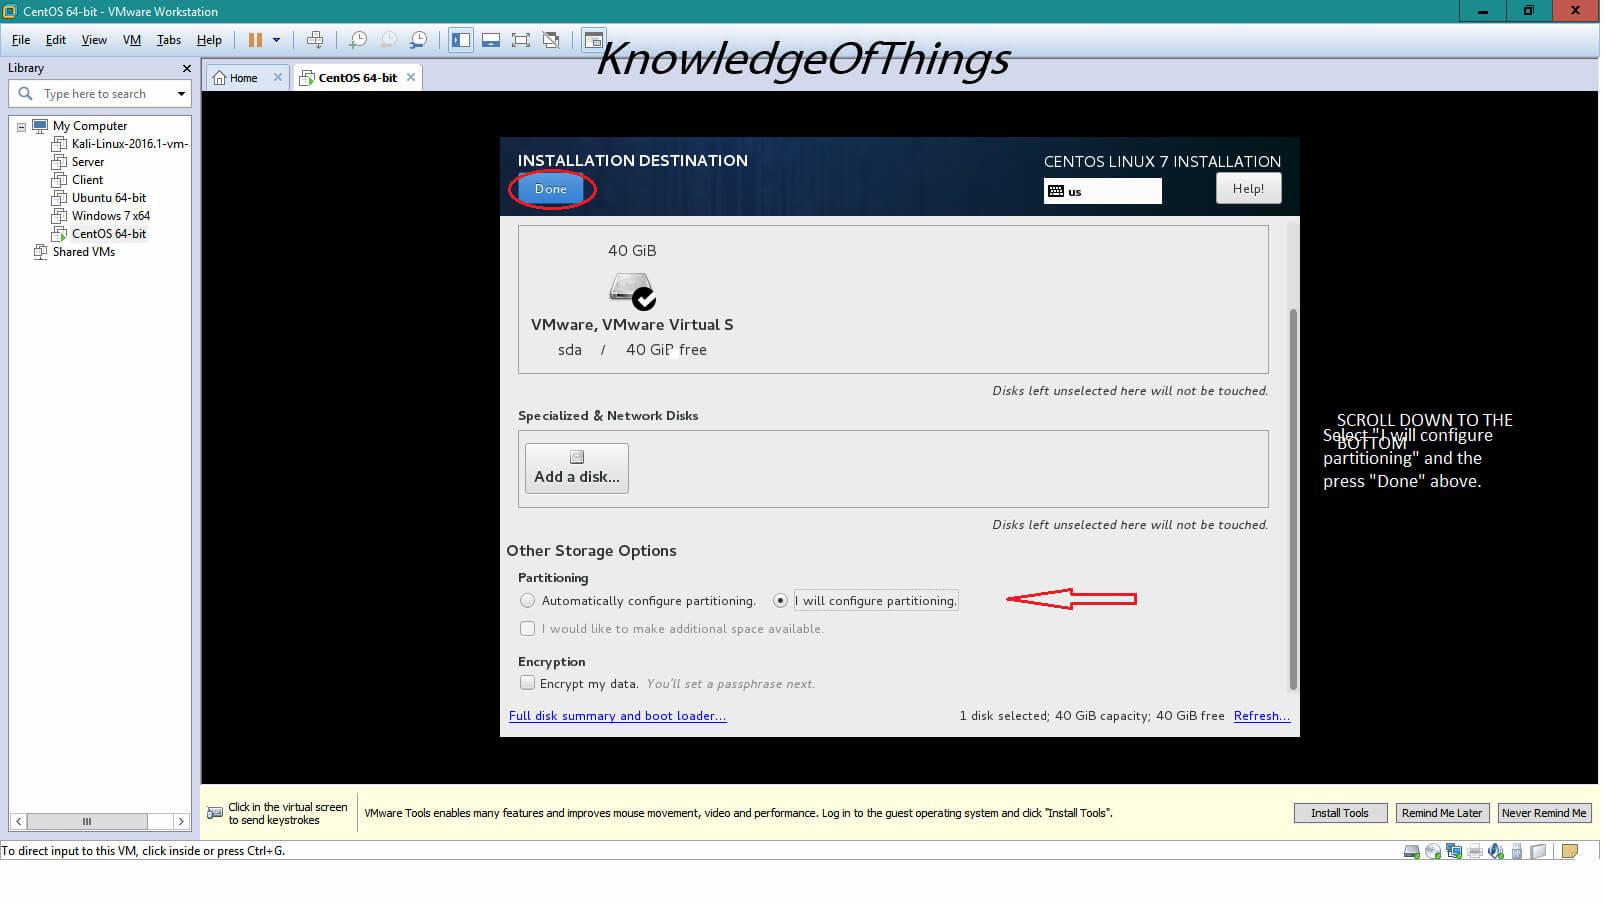 Install CentOS 7 as a Virtual Machine using VMware Workstation